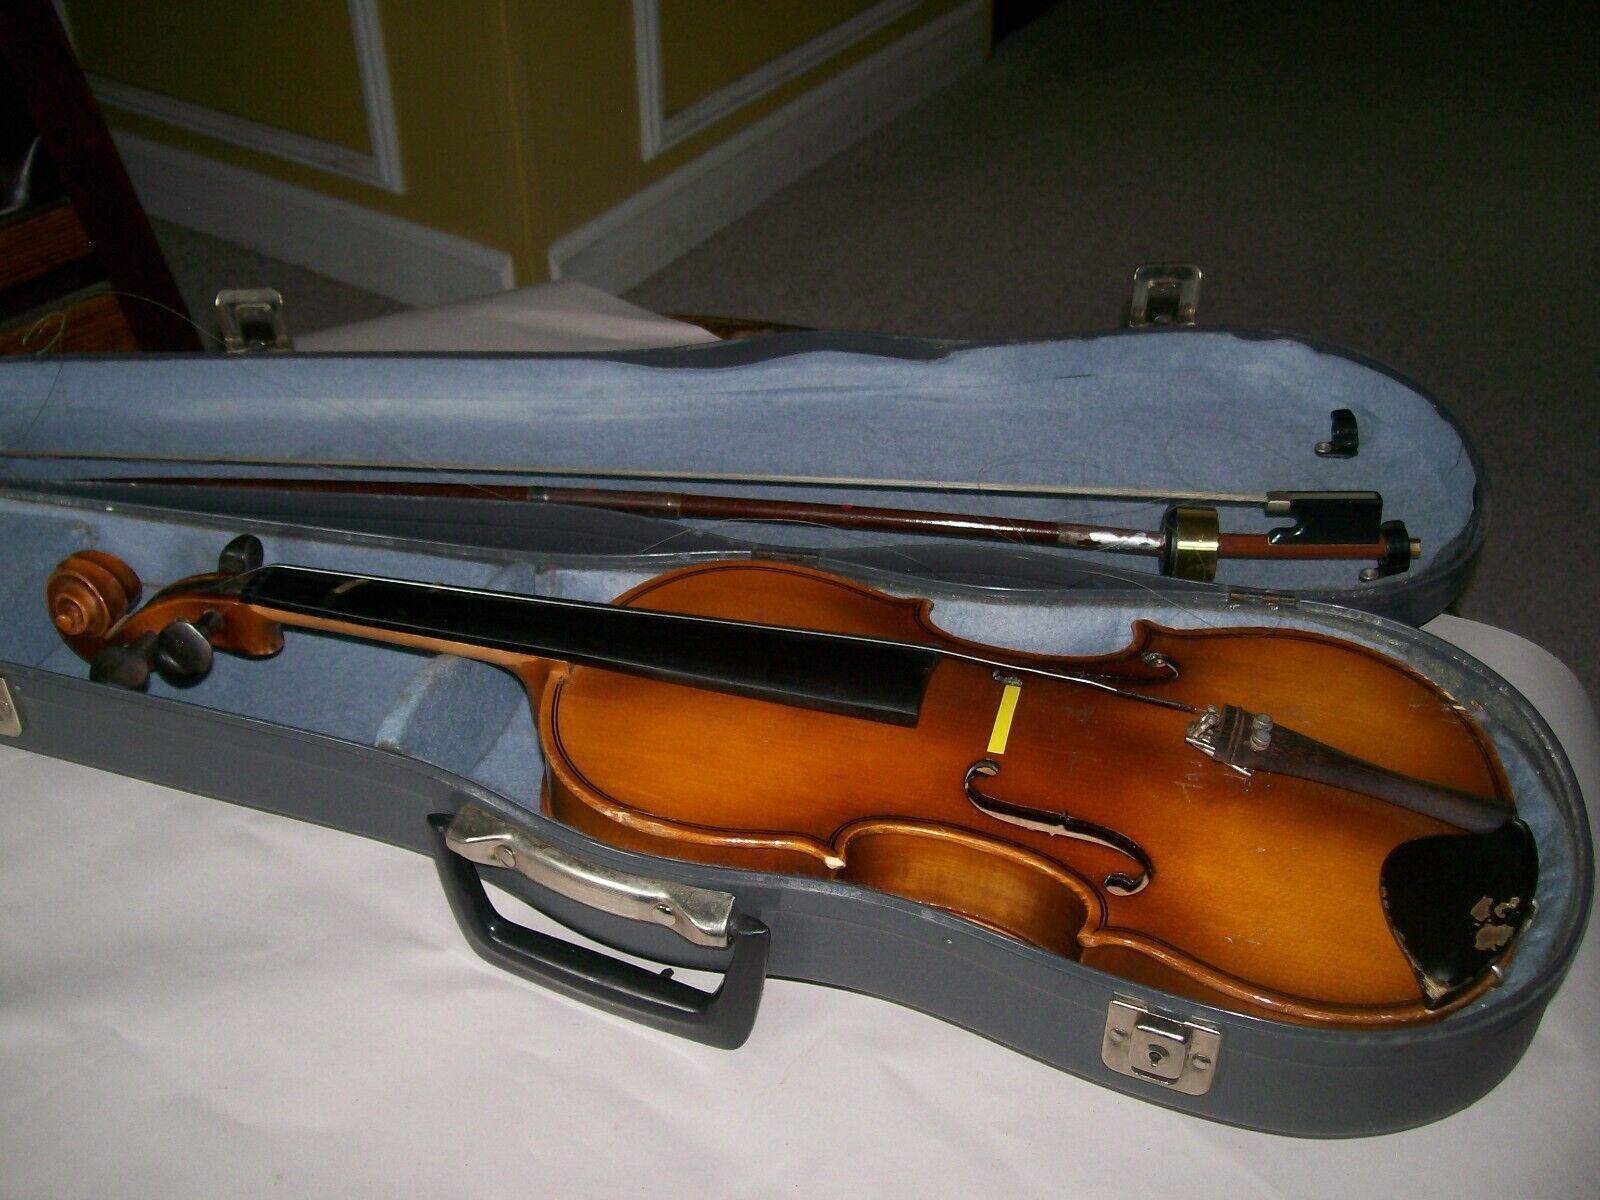 Violine 3 4 Sradivarius Model Japan w bow und case